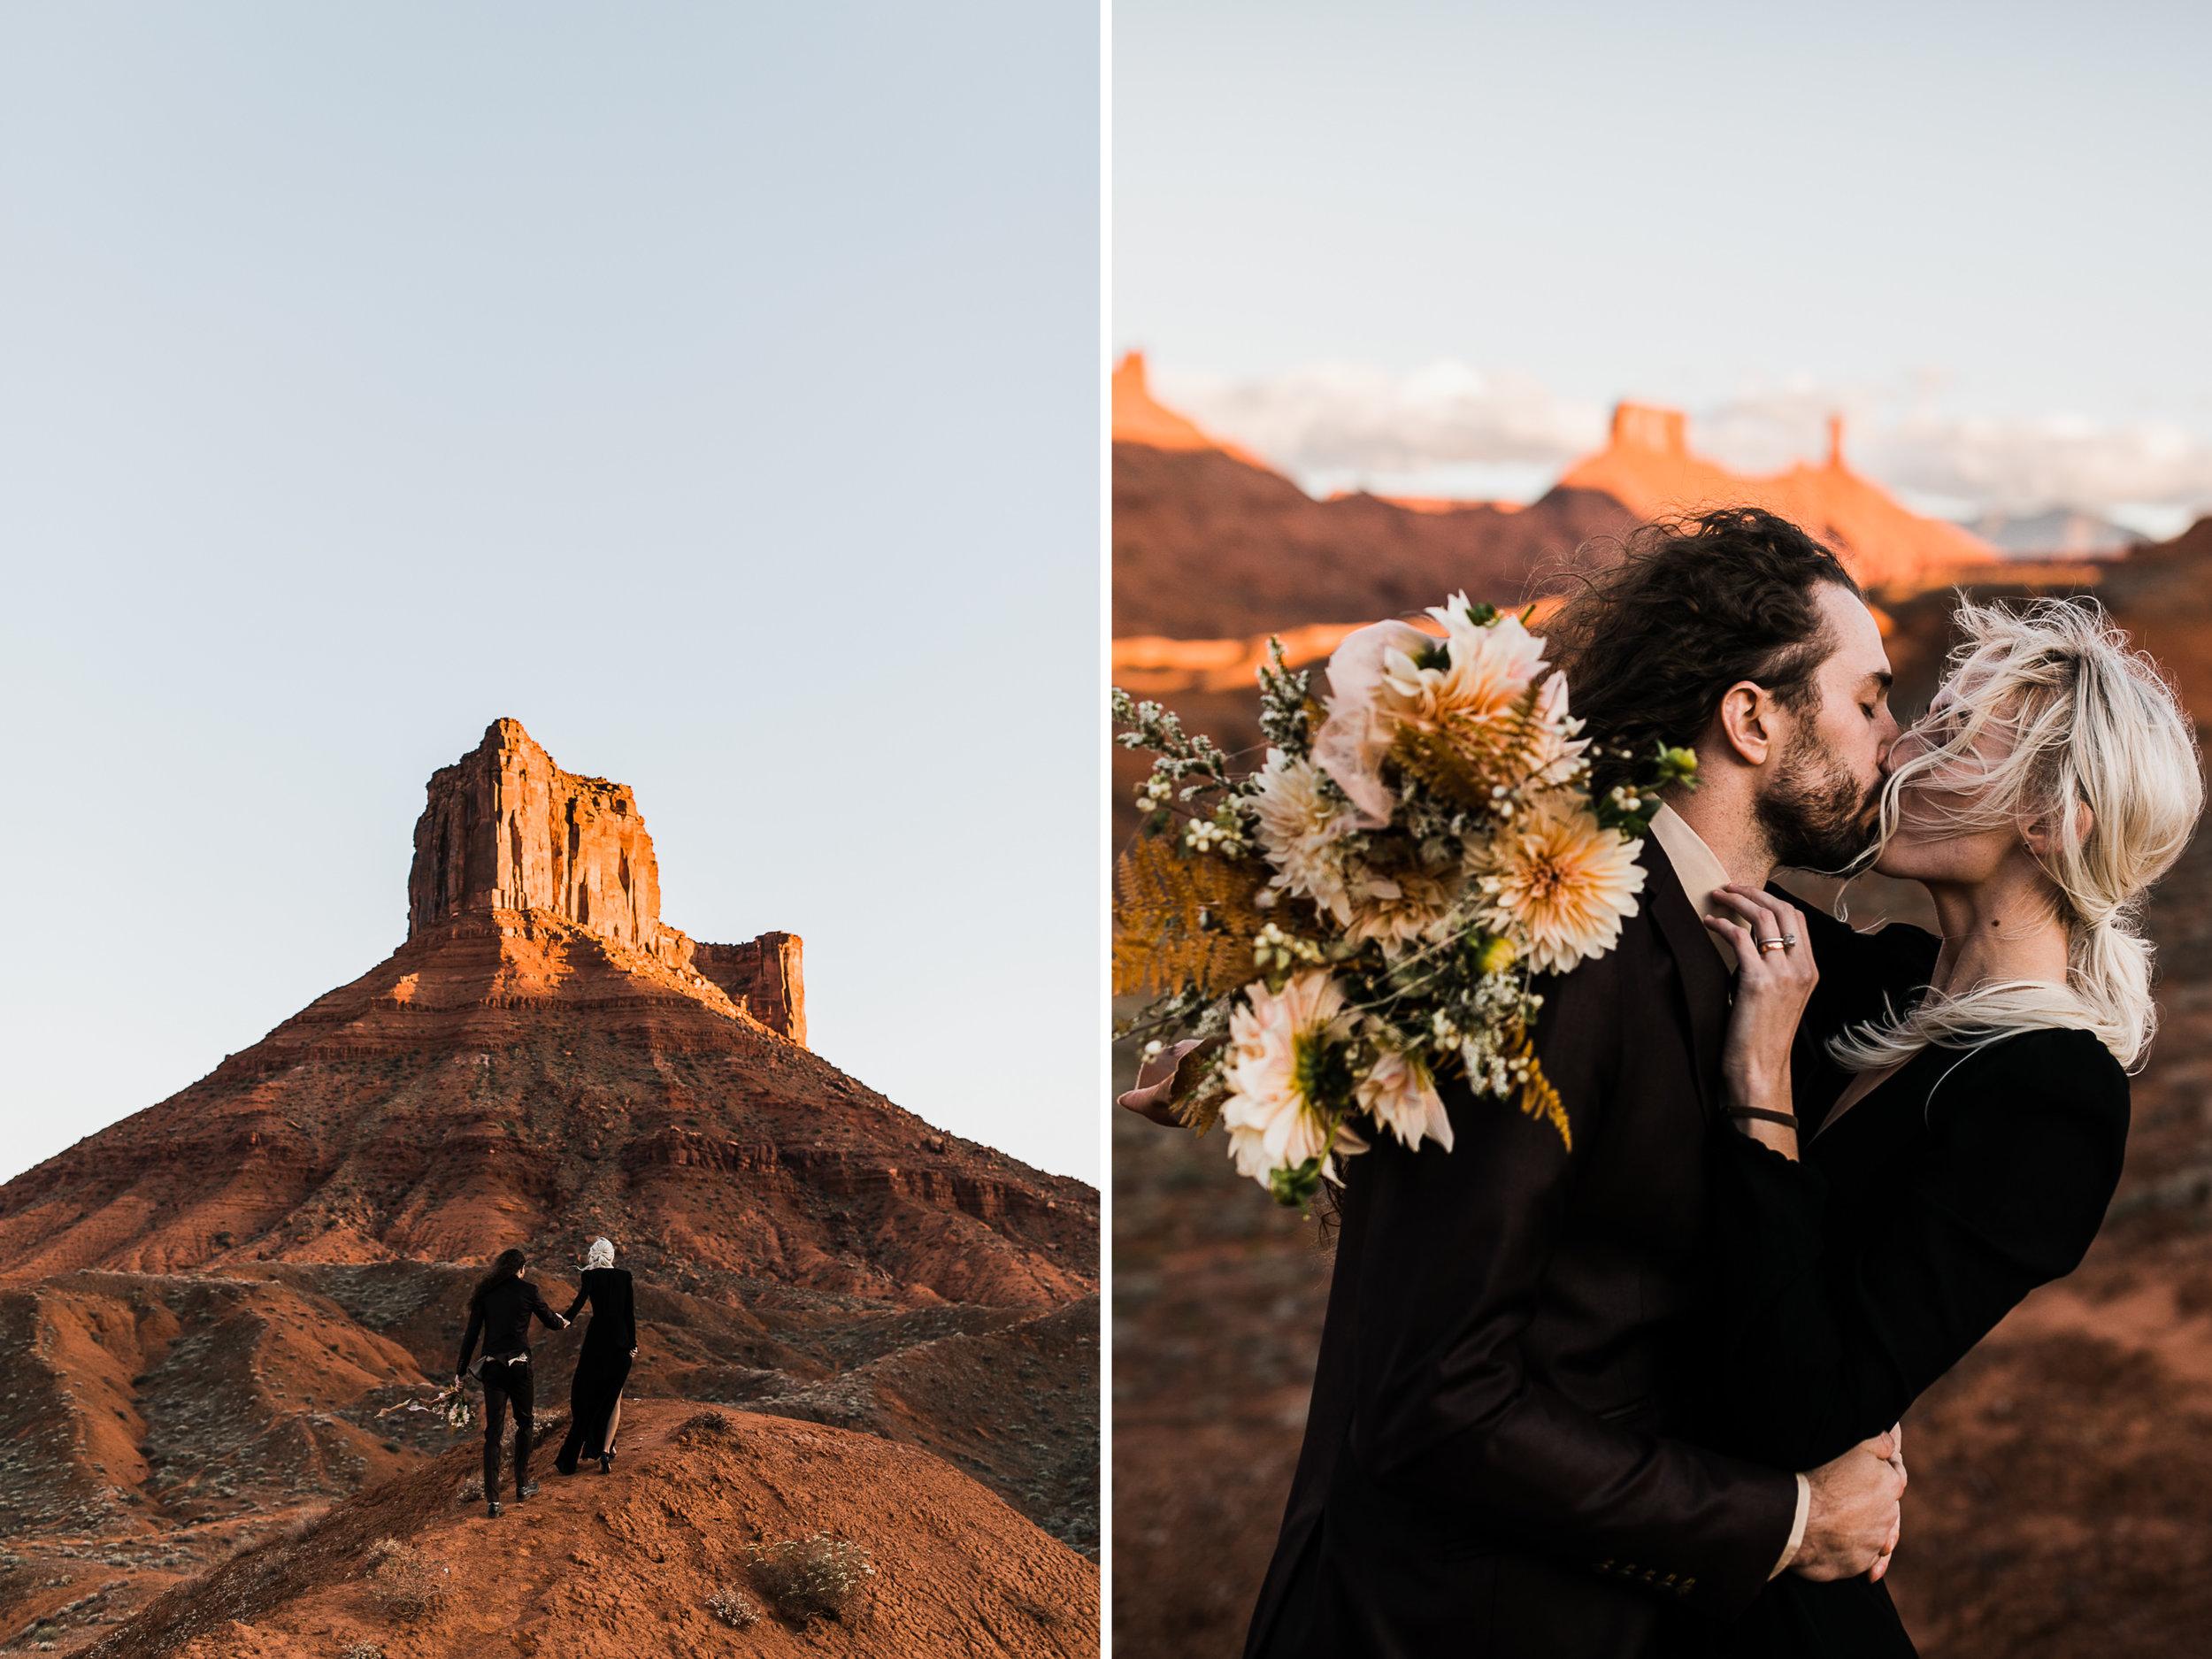 moab, utah intimate elopement in the desert + black wedding dress | destination adventure wedding photographers | the hearnes adventure photography | www.thehearnes.com